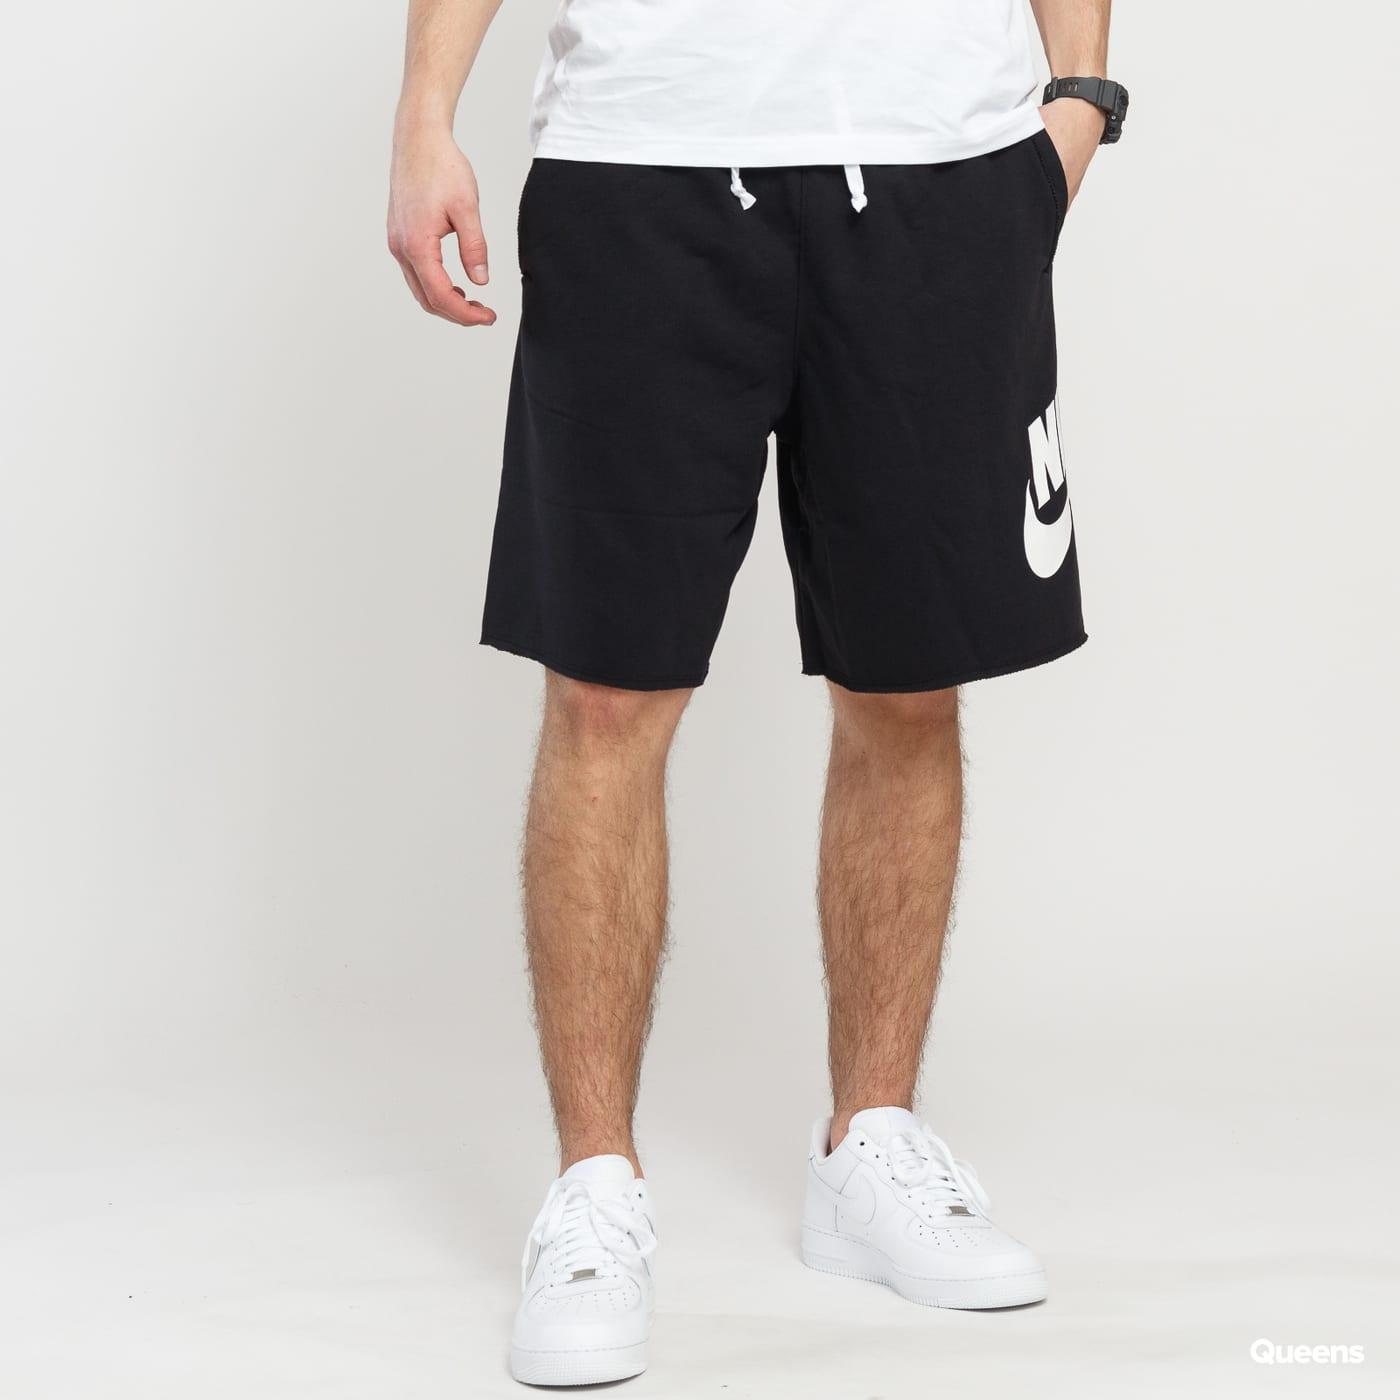 07ed782332f2d Sweat Shorts Nike M NSW HE Short FT Alumni black (AR2375-010) – Queens 💚